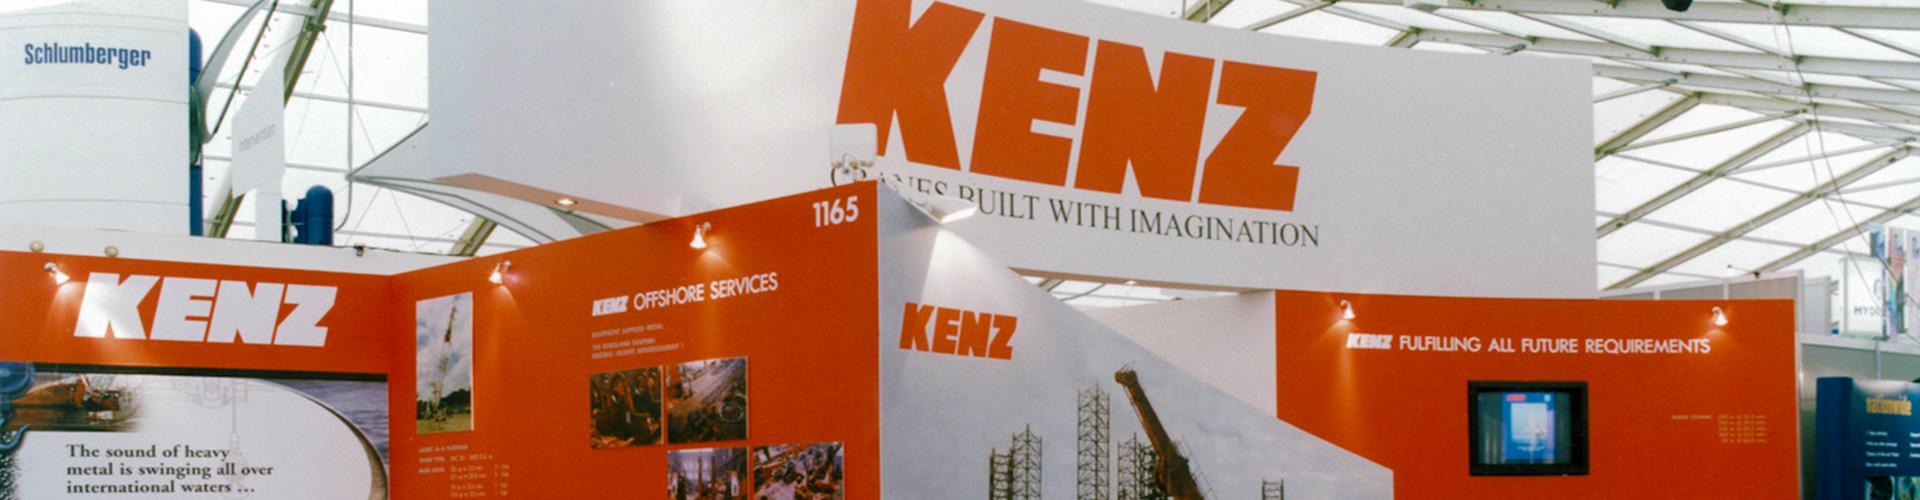 kenz-banner